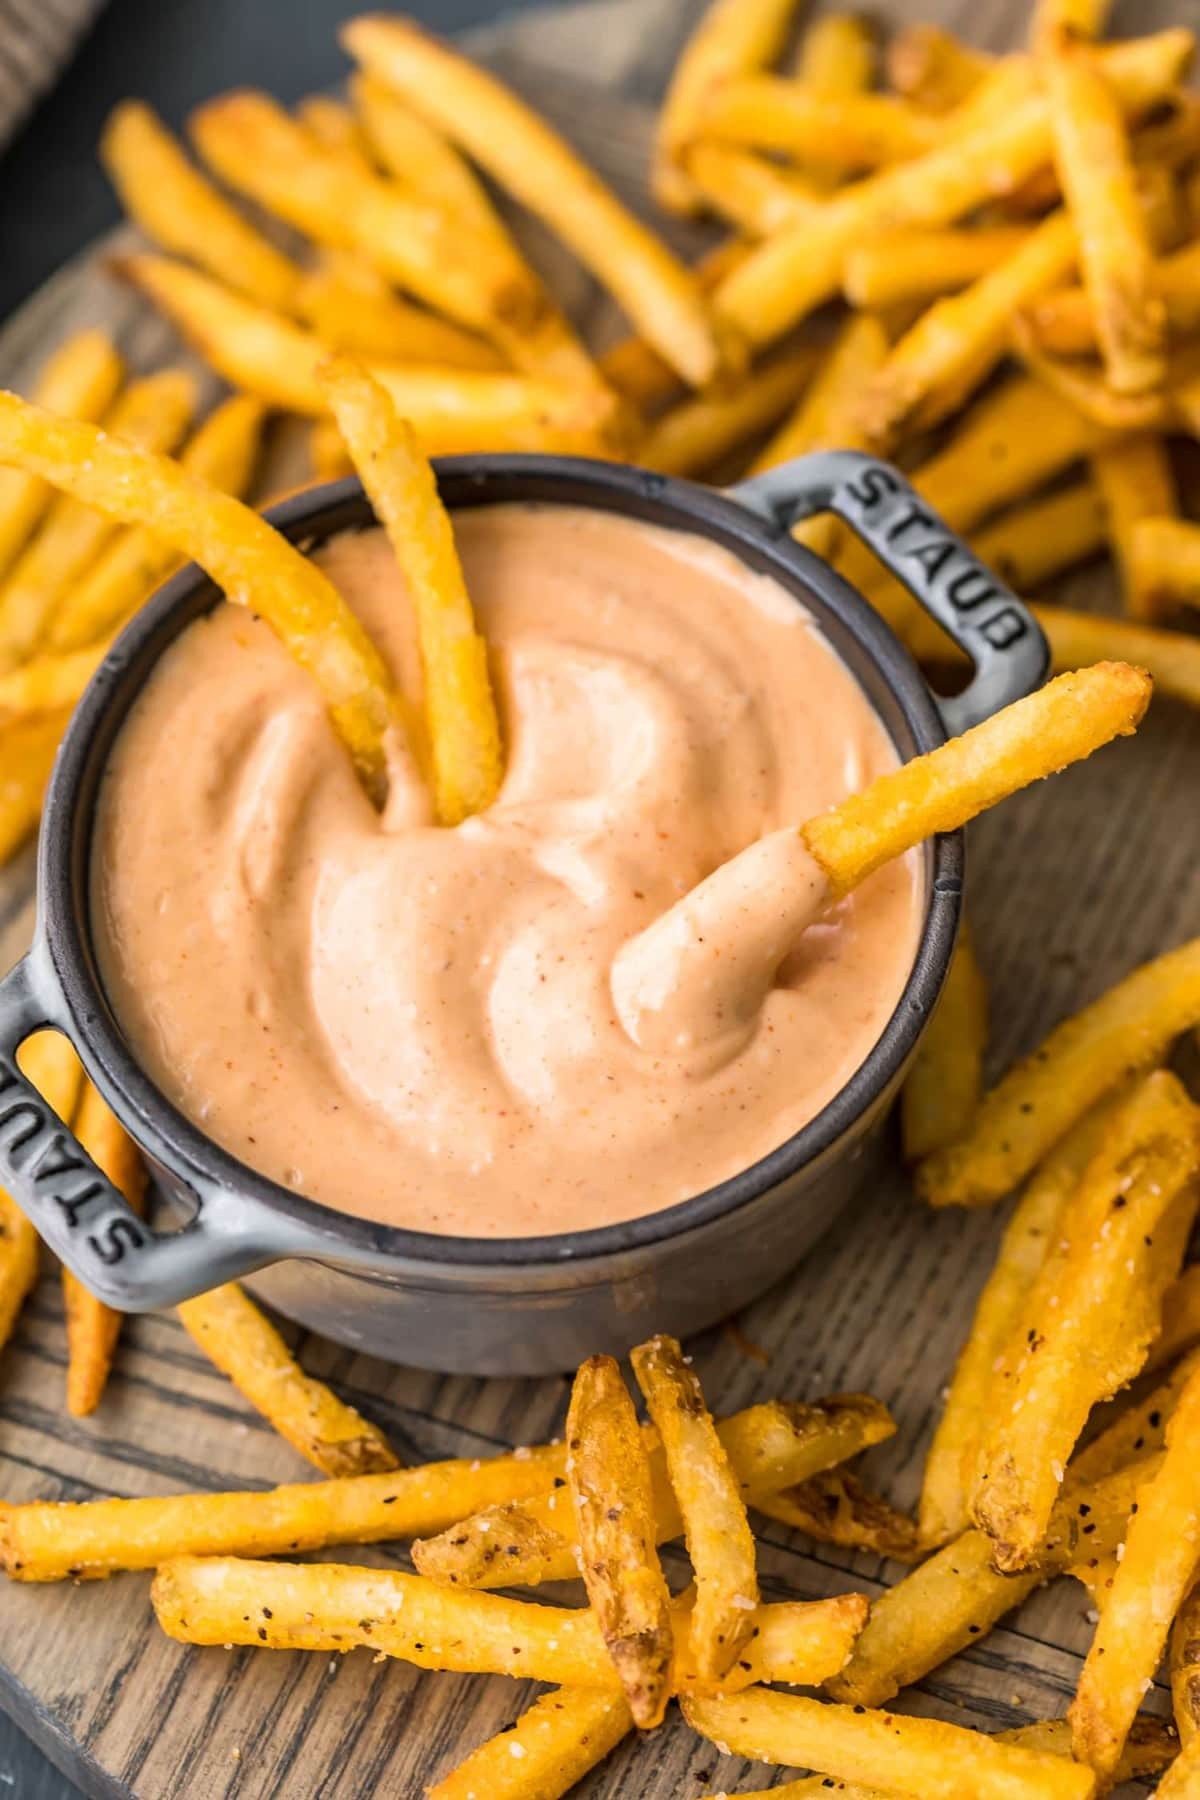 Fries in fry sauce